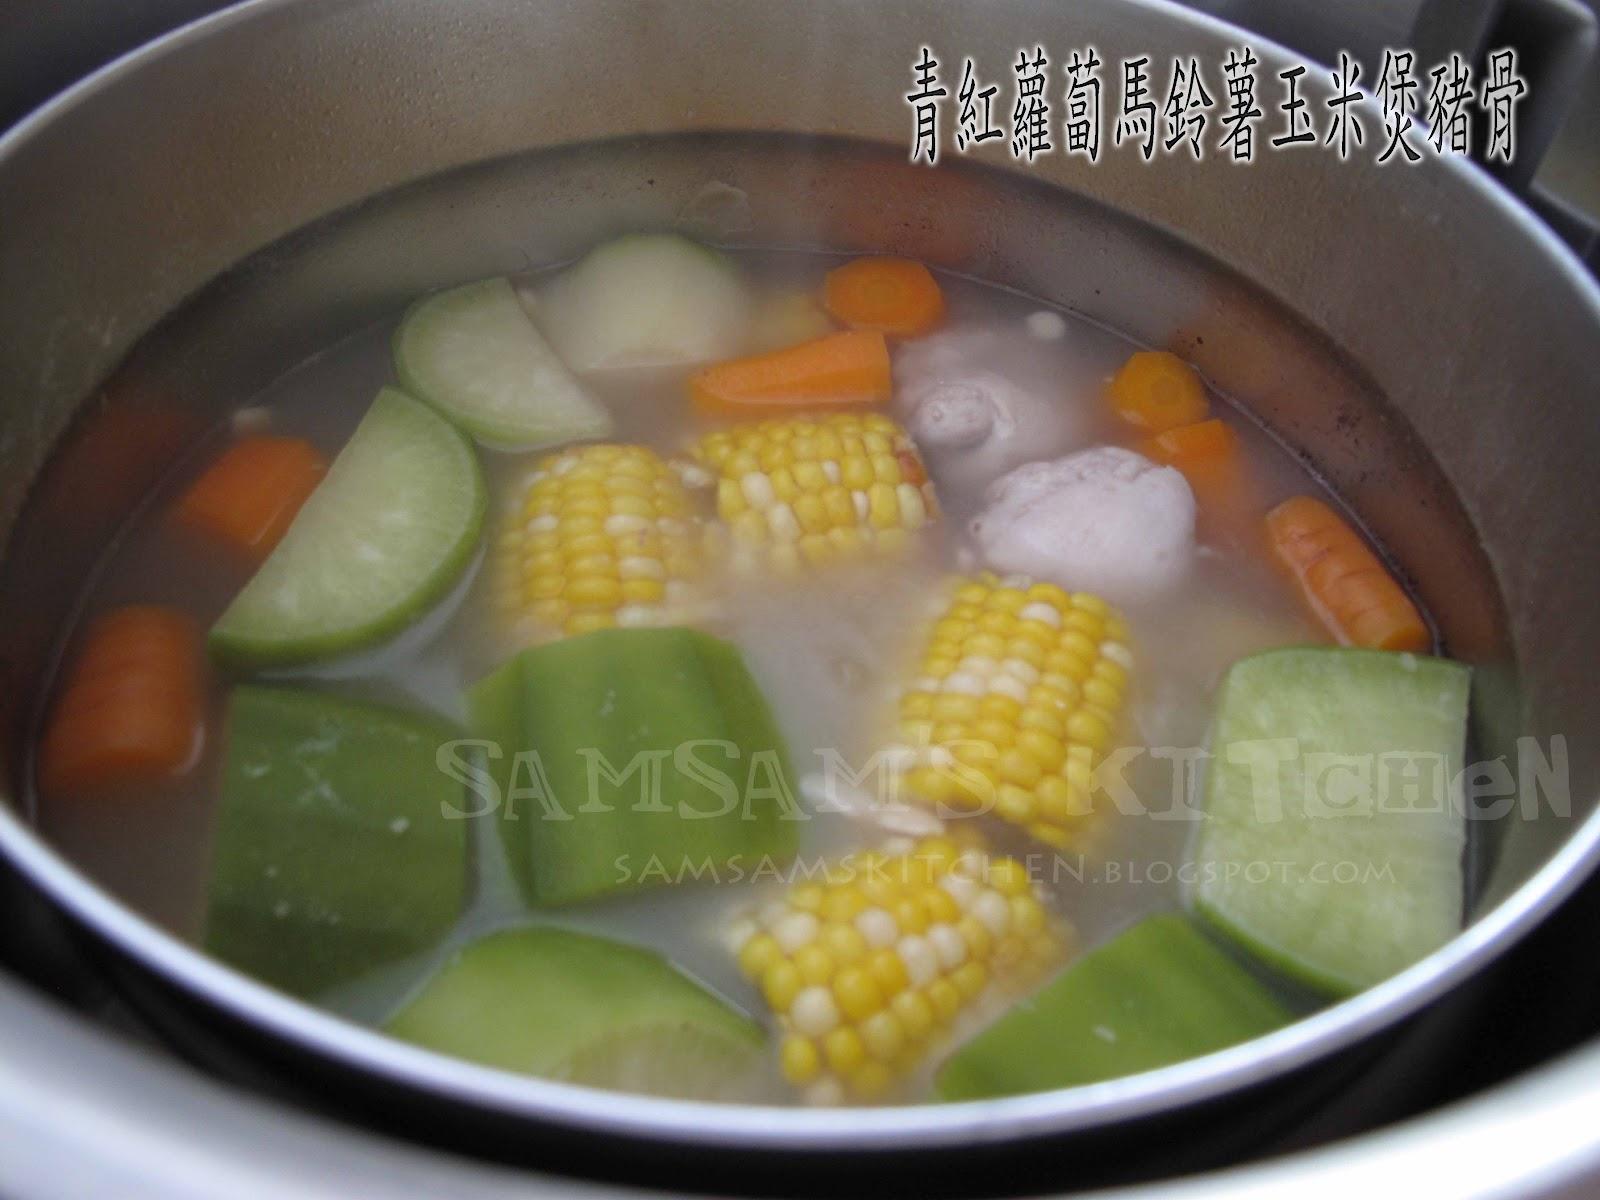 samsam s kitchen 青 紅蘿蔔 馬鈴薯 玉米 煲 豬 骨